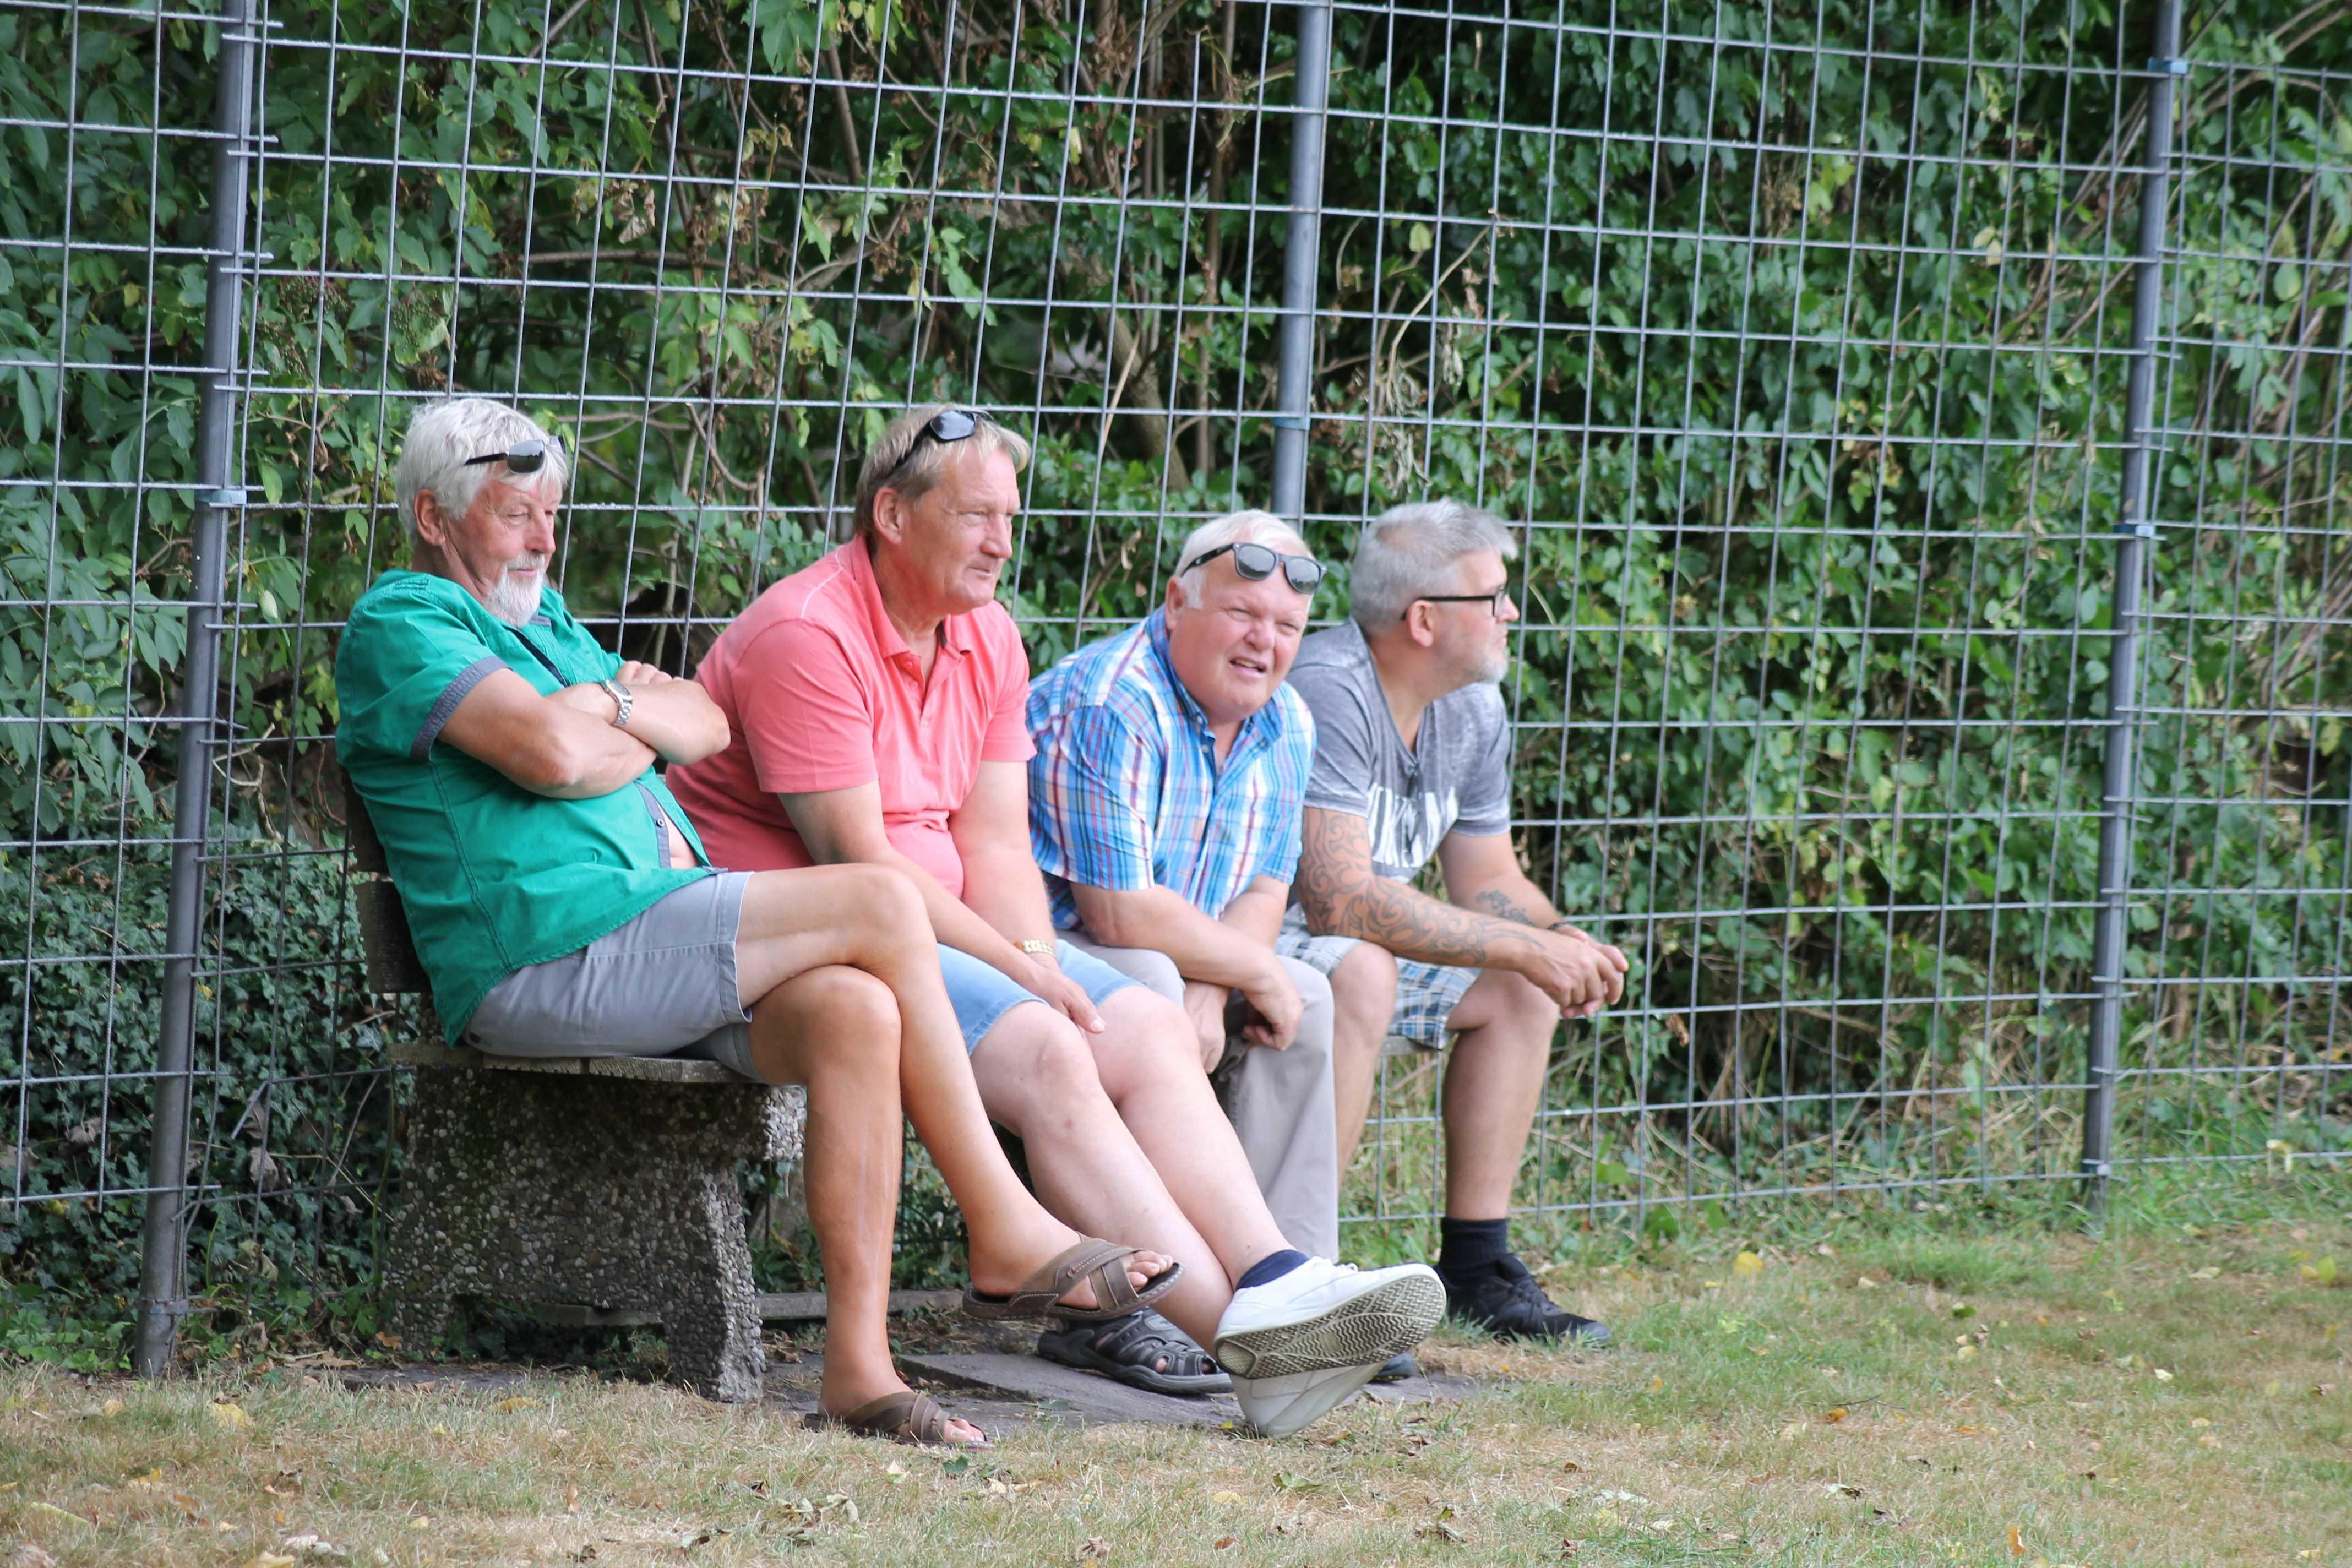 2018-07-29 Sportwoche - Sportpicknick & Football & Fußball (99)